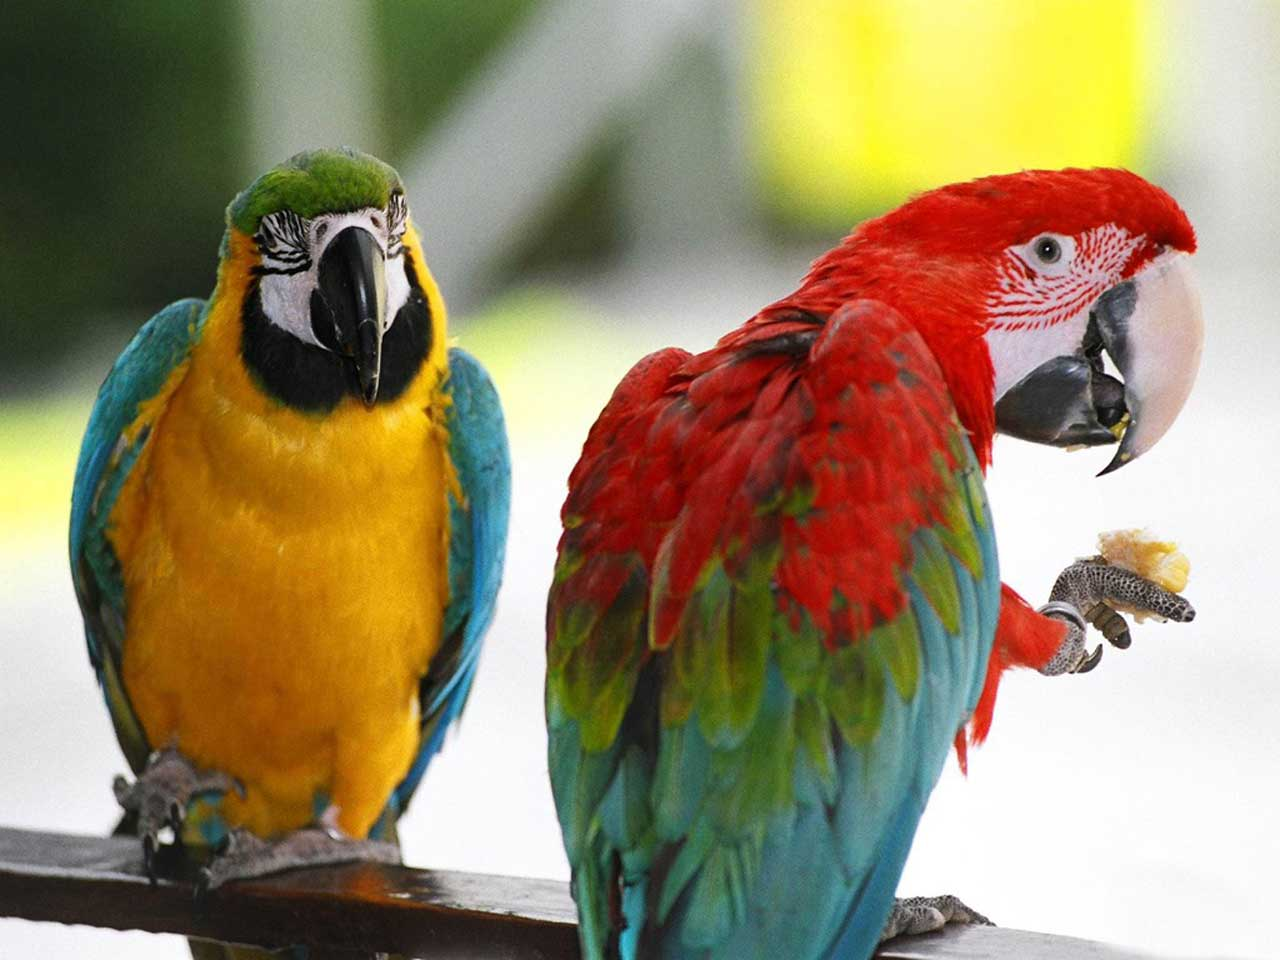 parrots wallpaper bird - photo #29